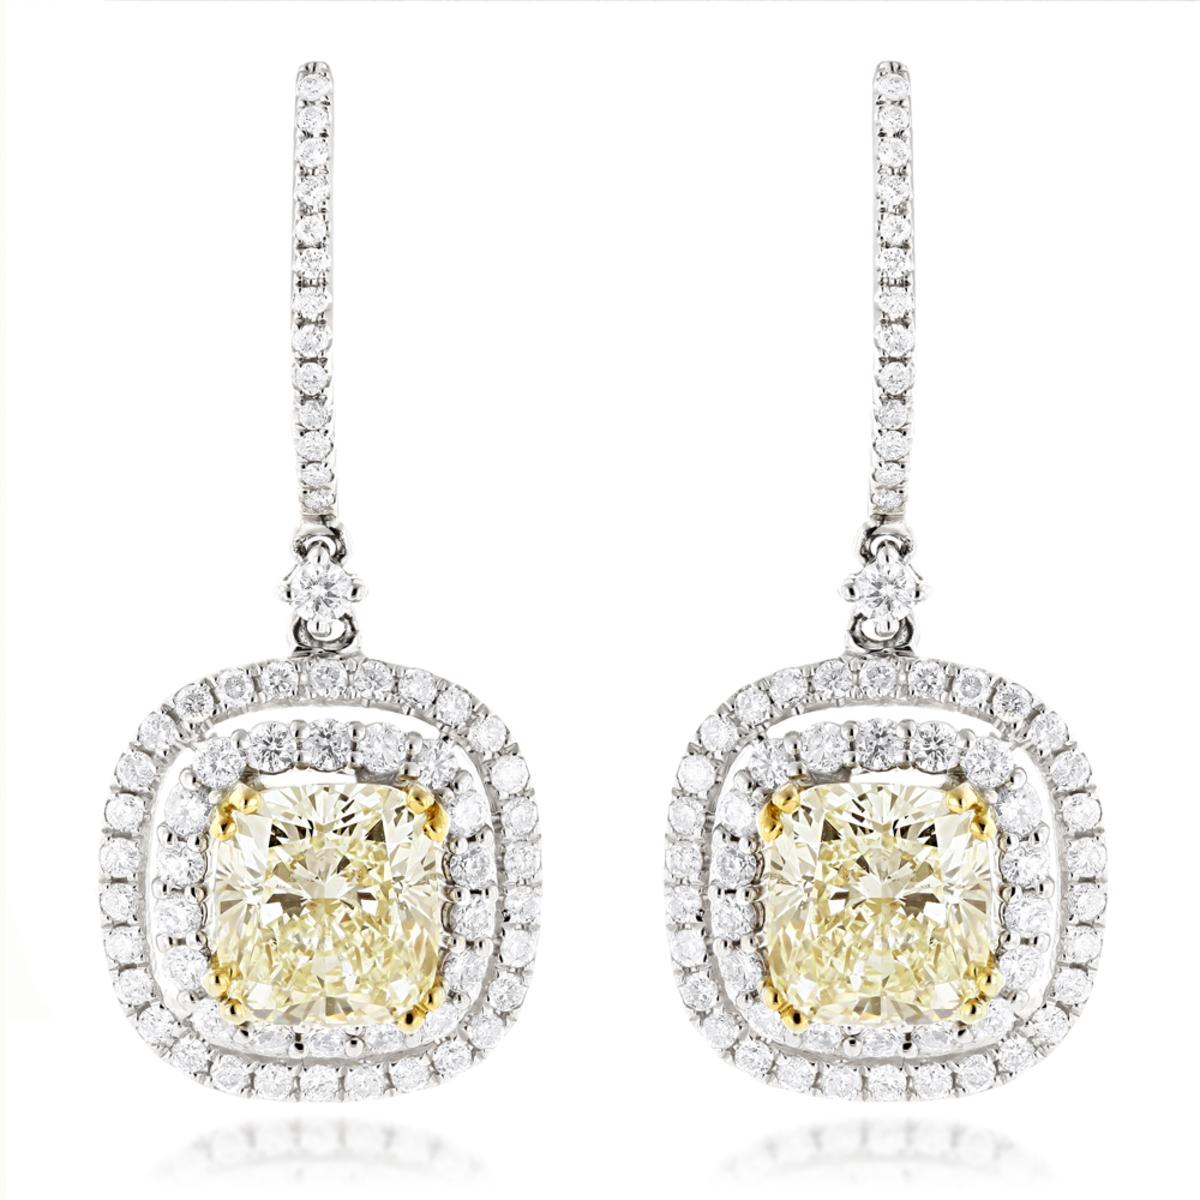 Dangling Designer Diamond Drop Earrings 6.5ct 18K Gold Yellow Diamonds